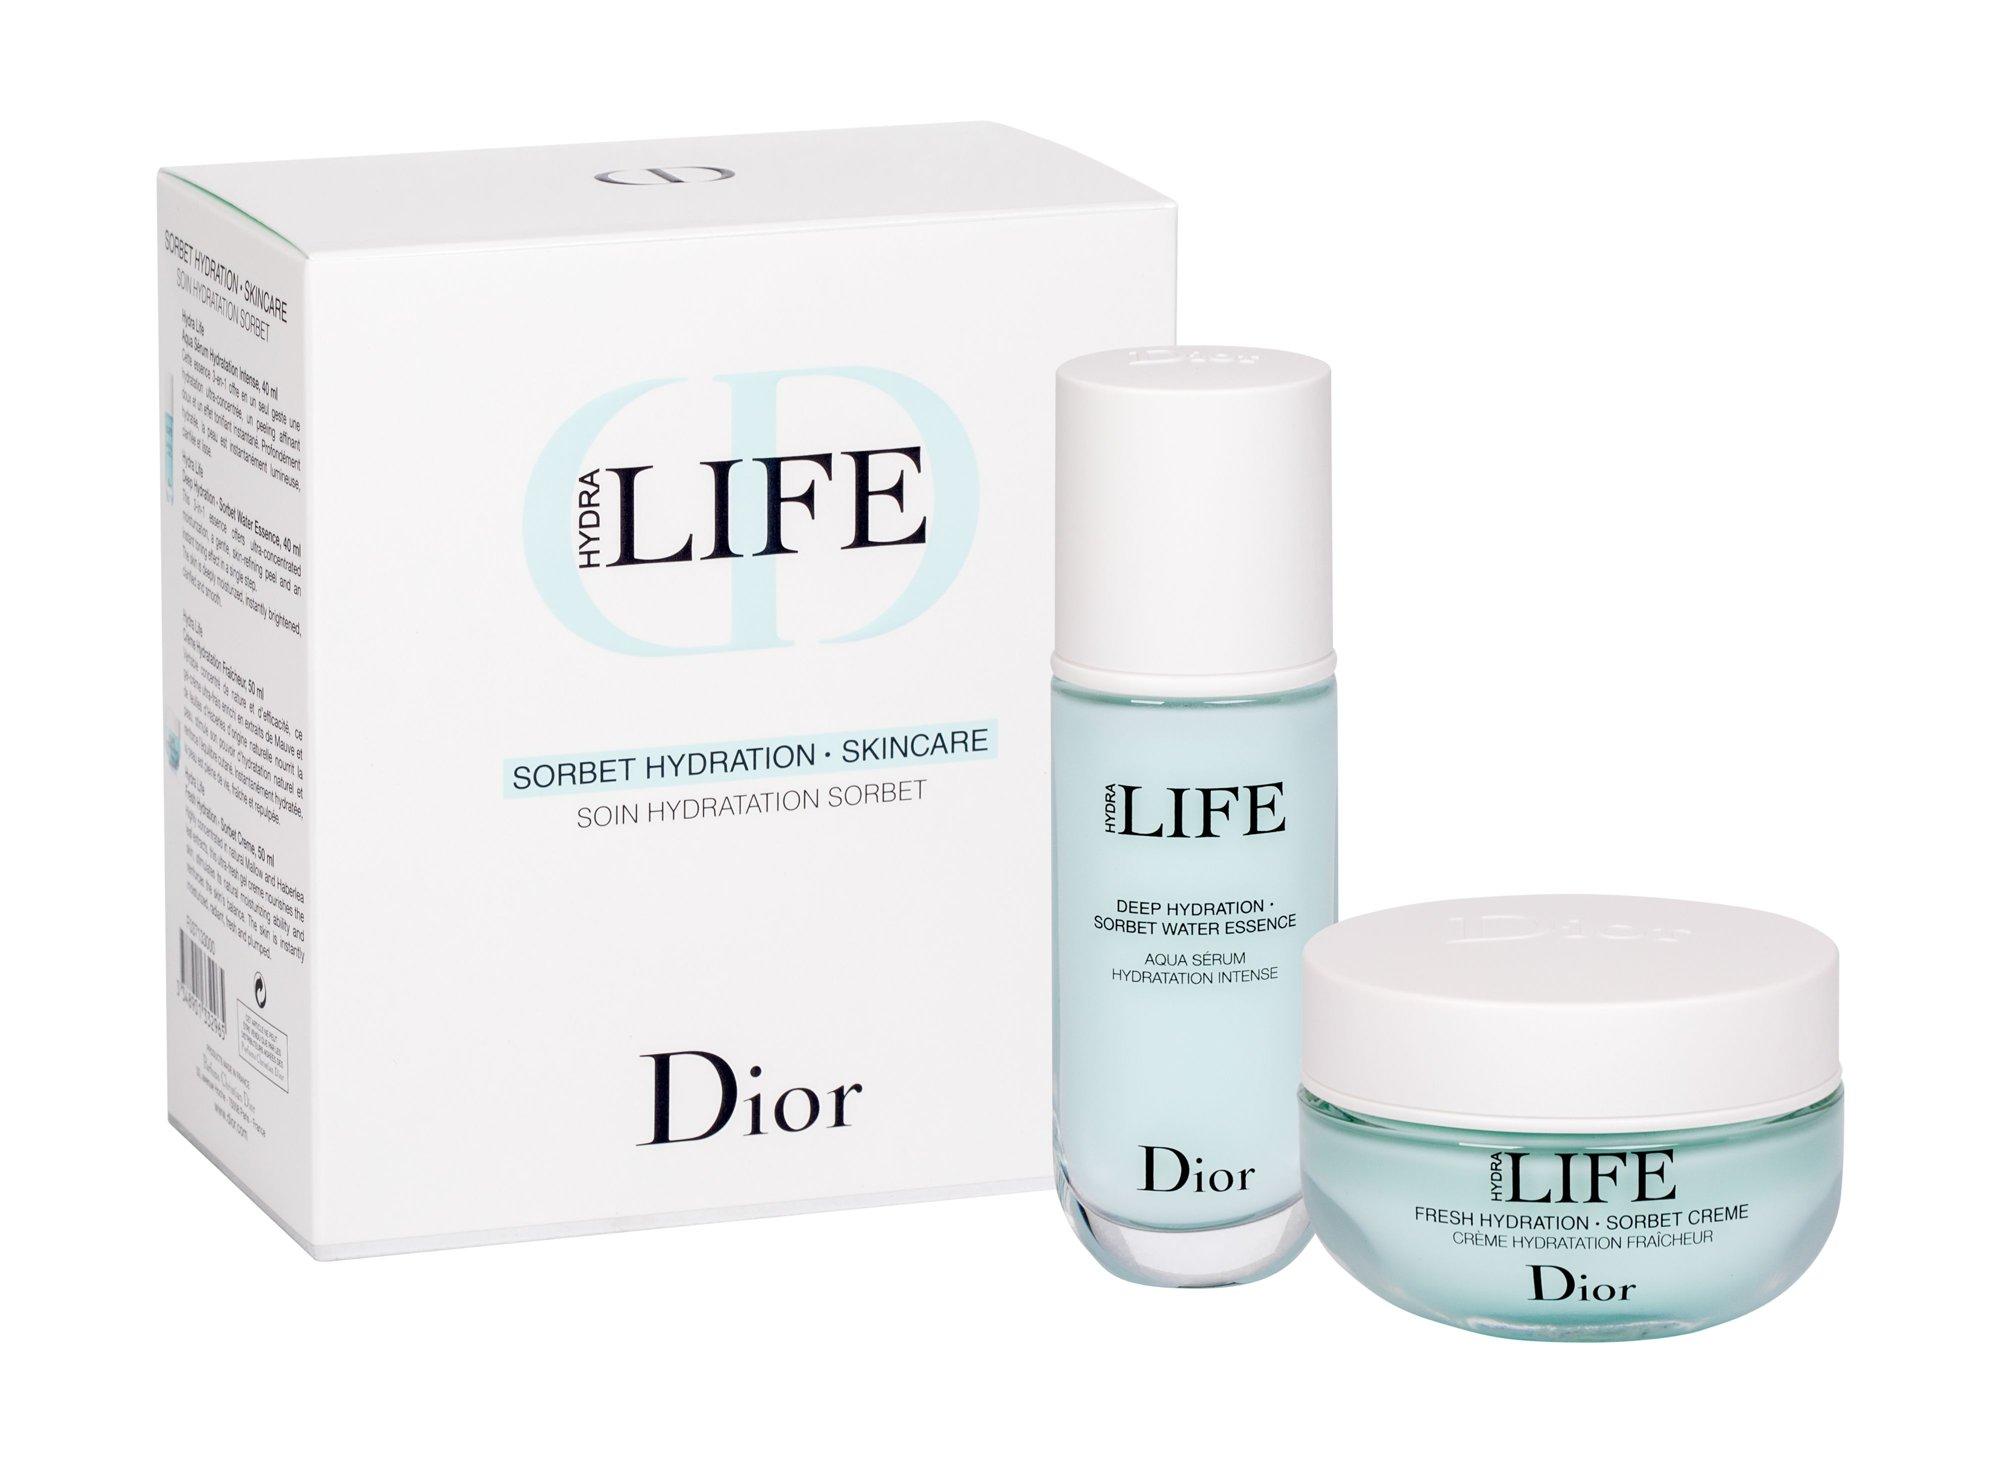 Christian Dior Hydra Life Day Cream 50ml